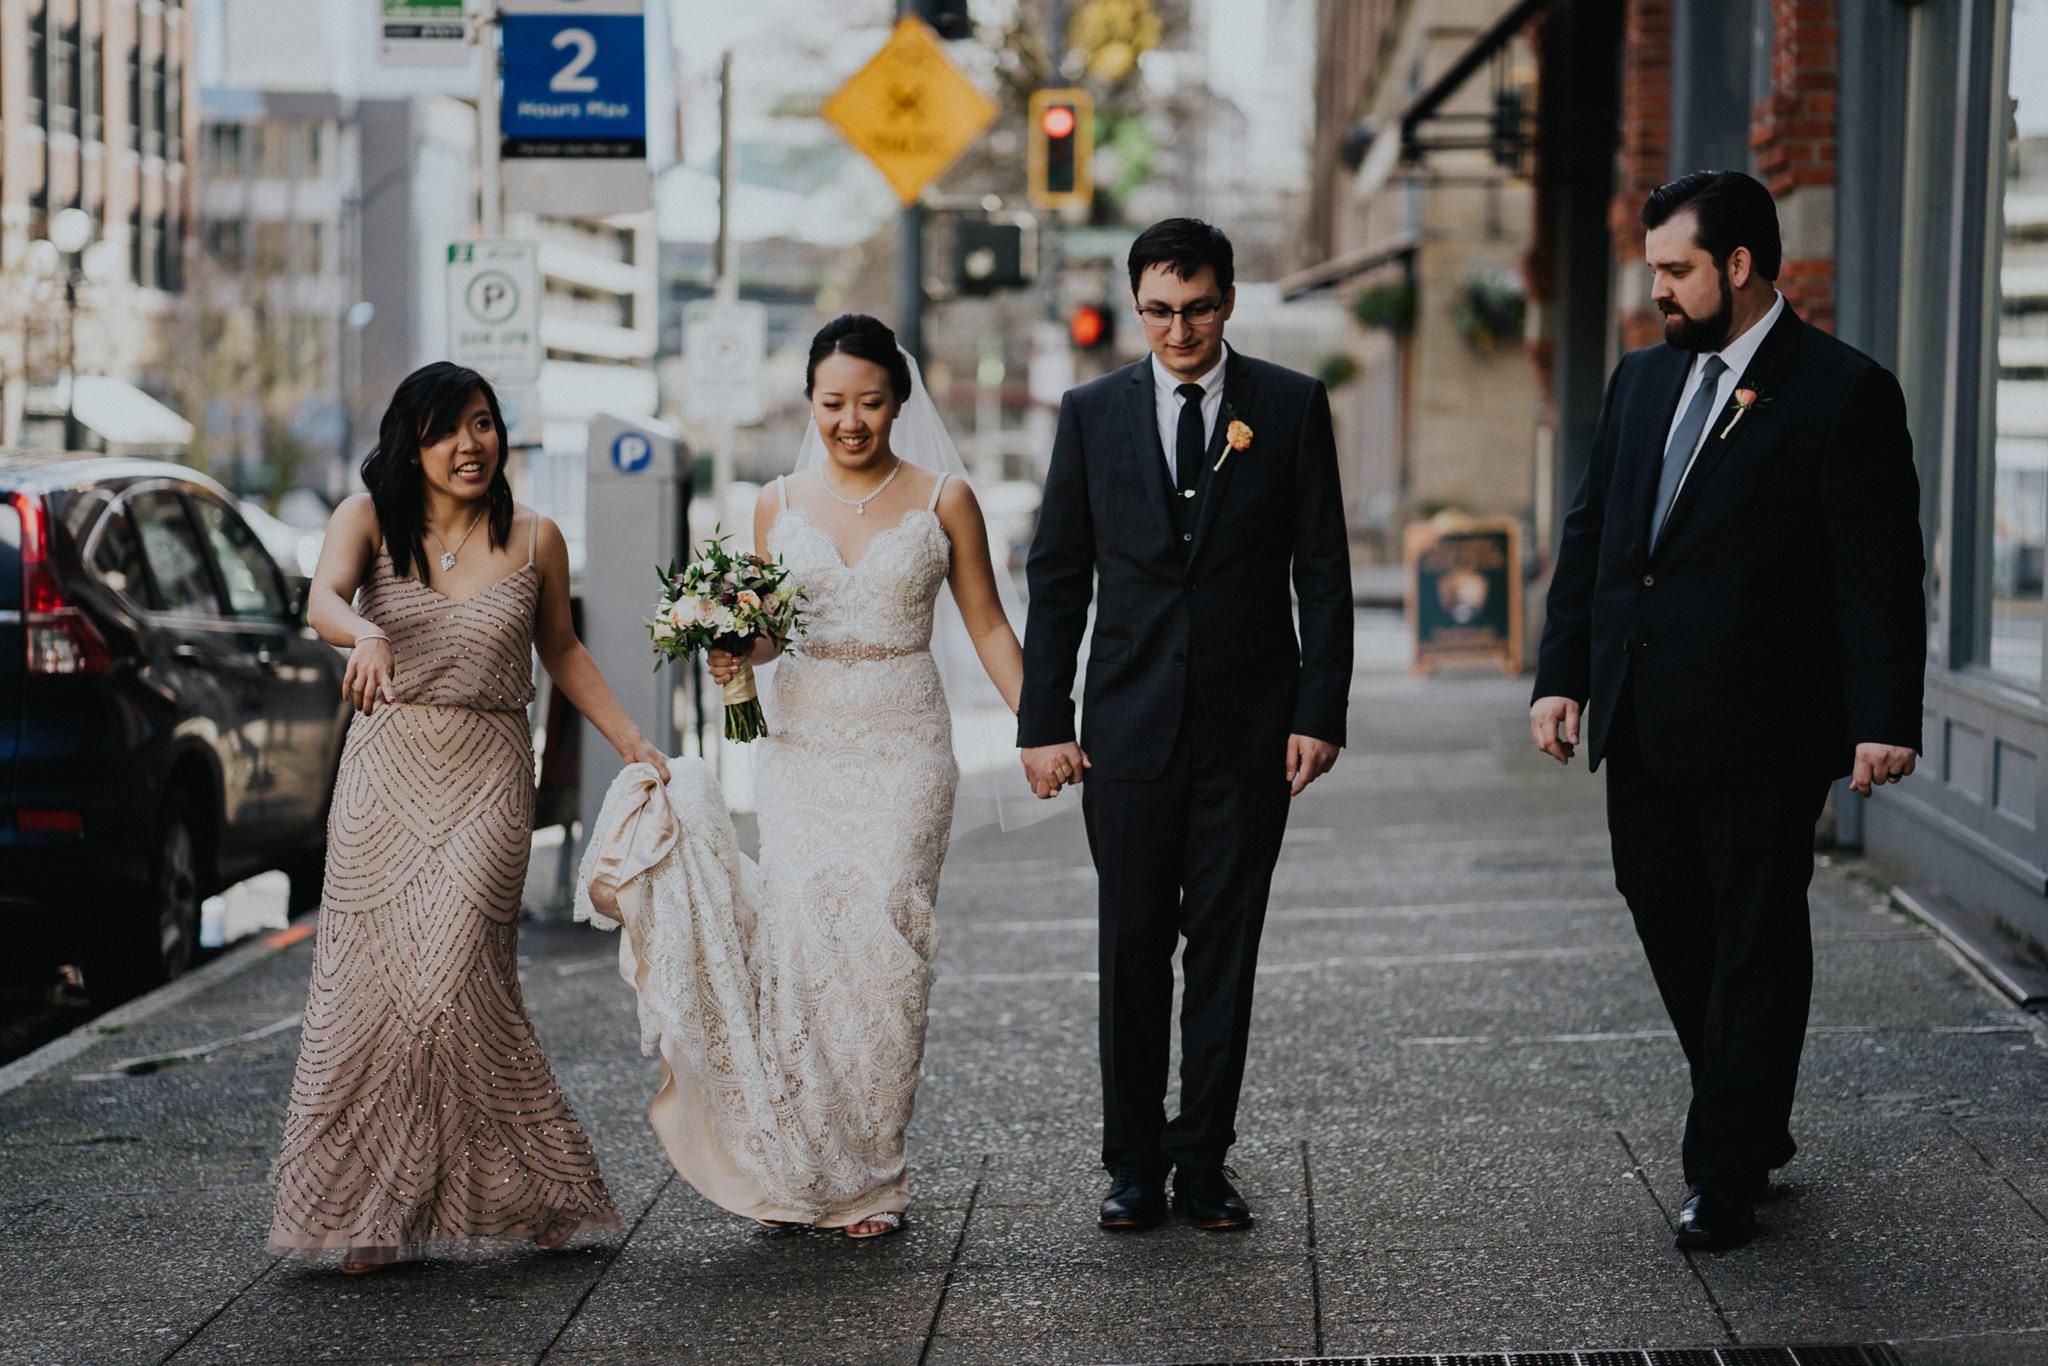 Wedding Party City Walk Alfred Tang Weddings